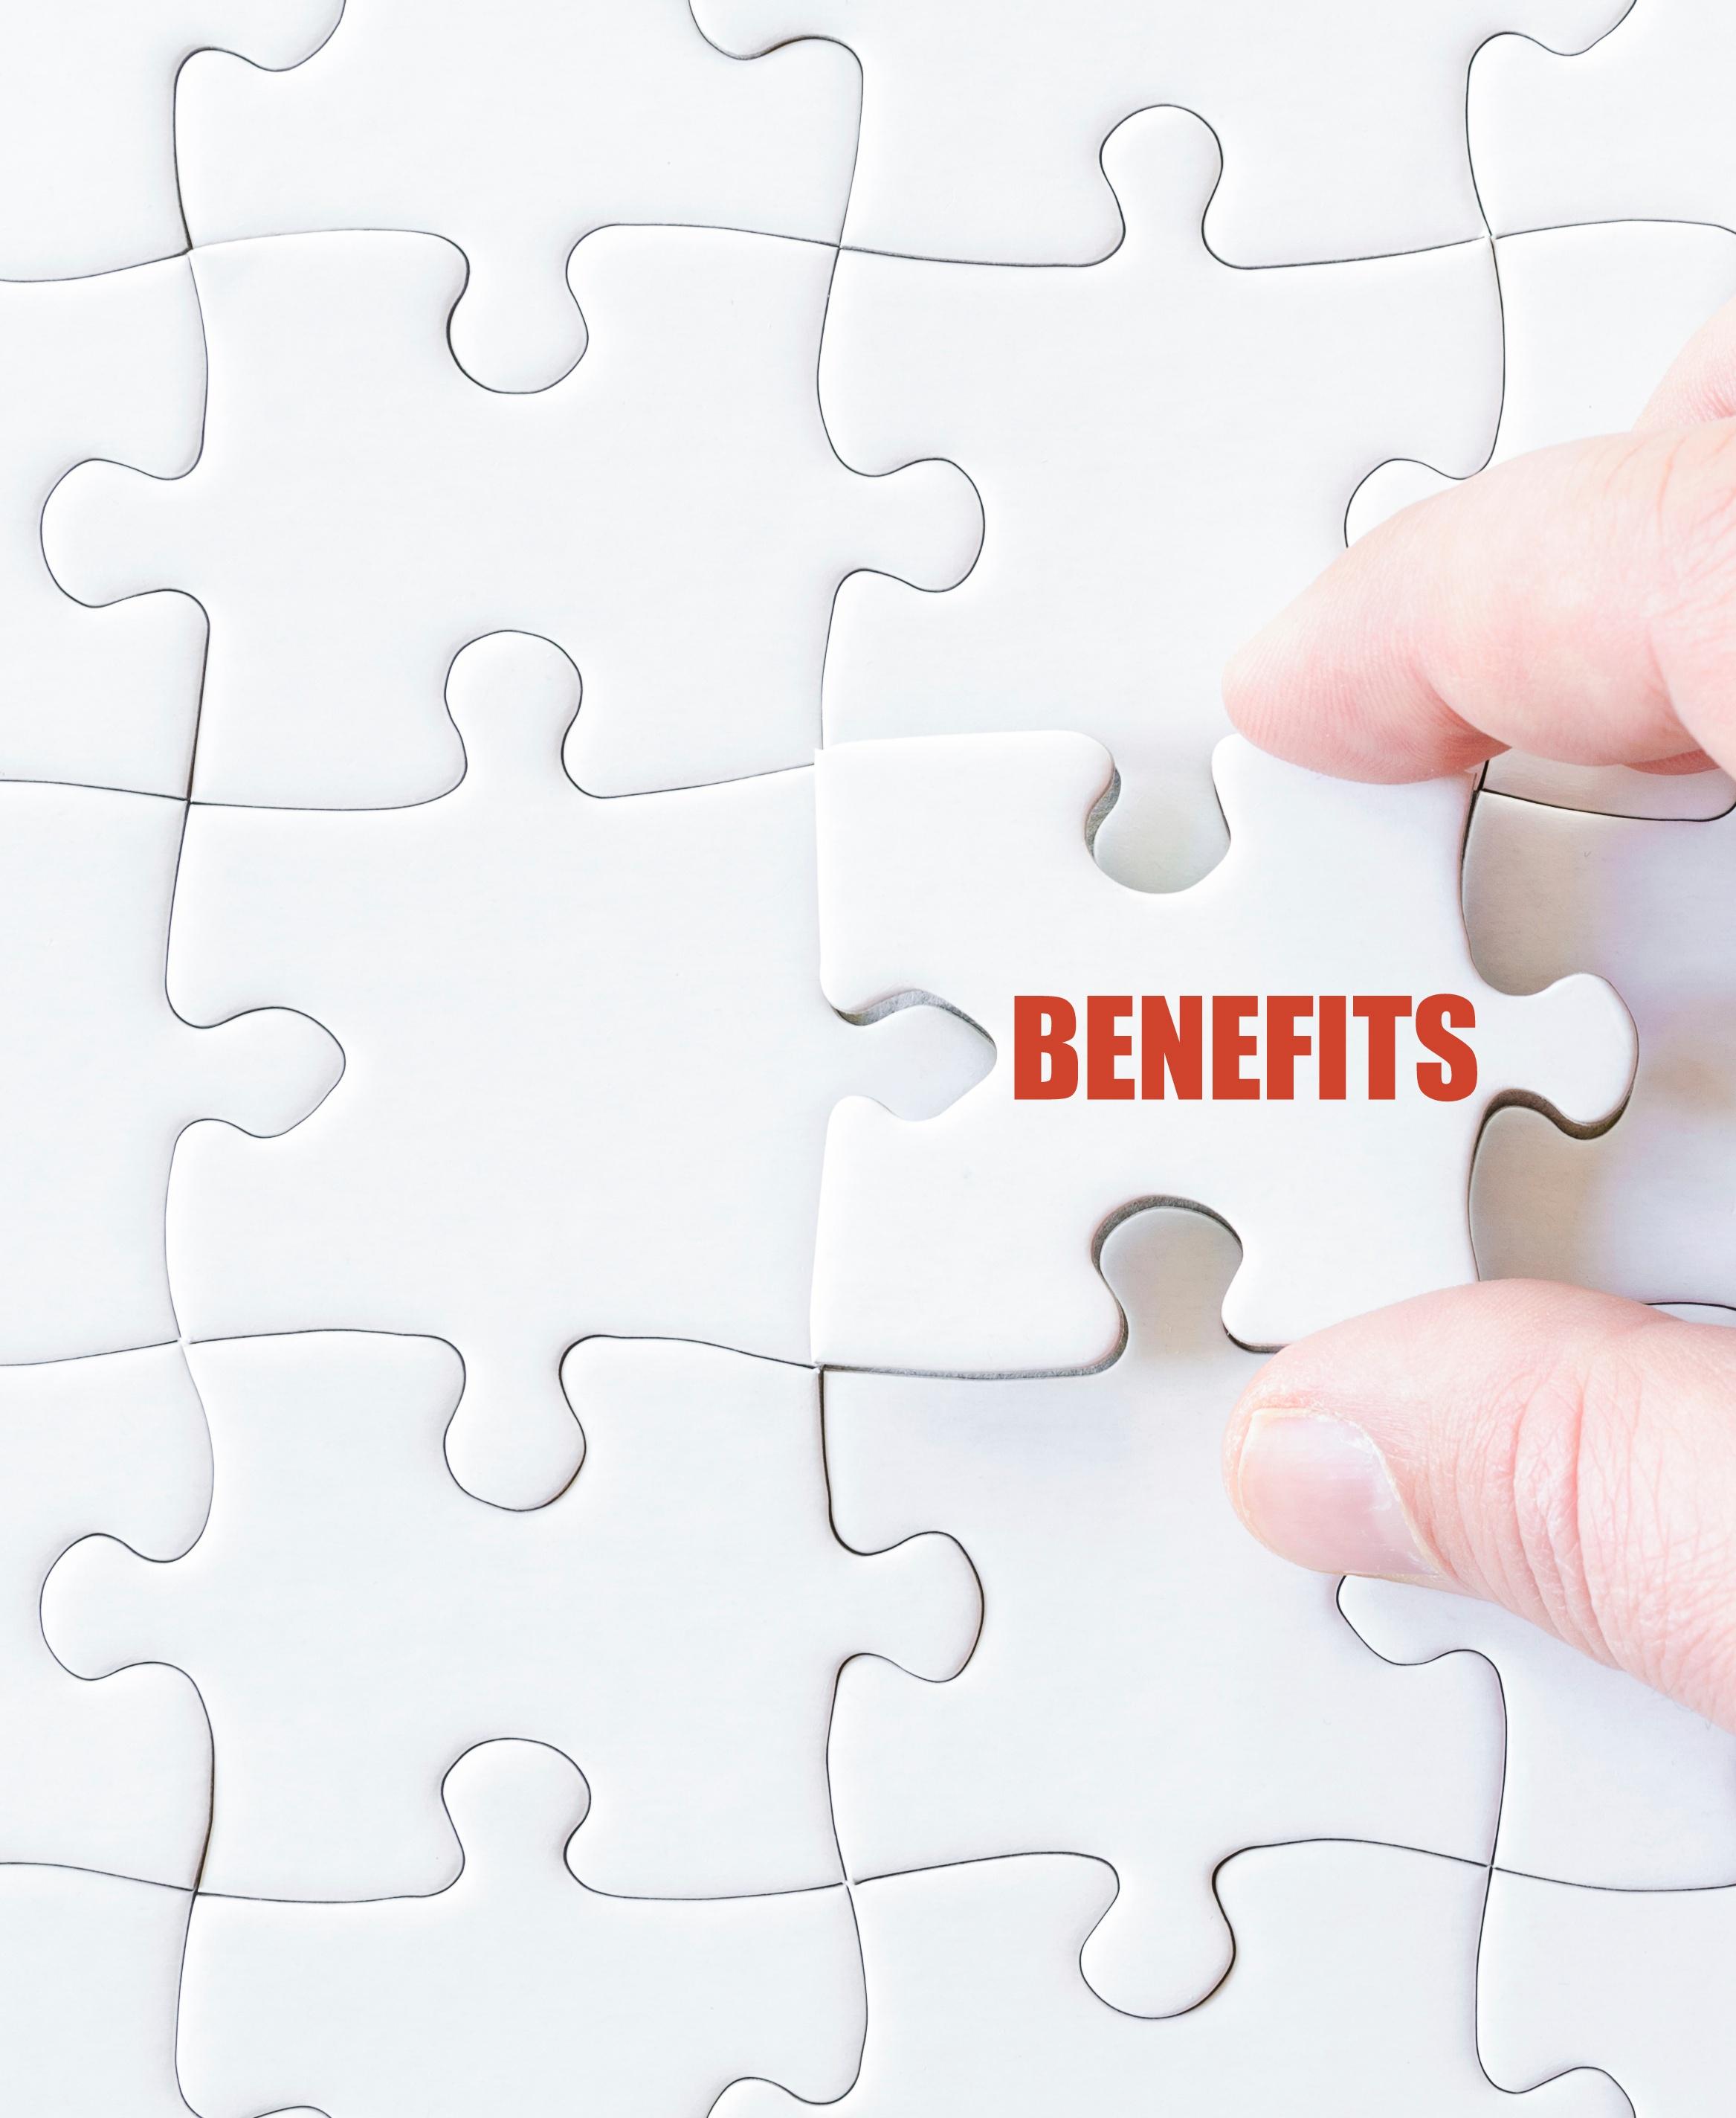 project management software benefits